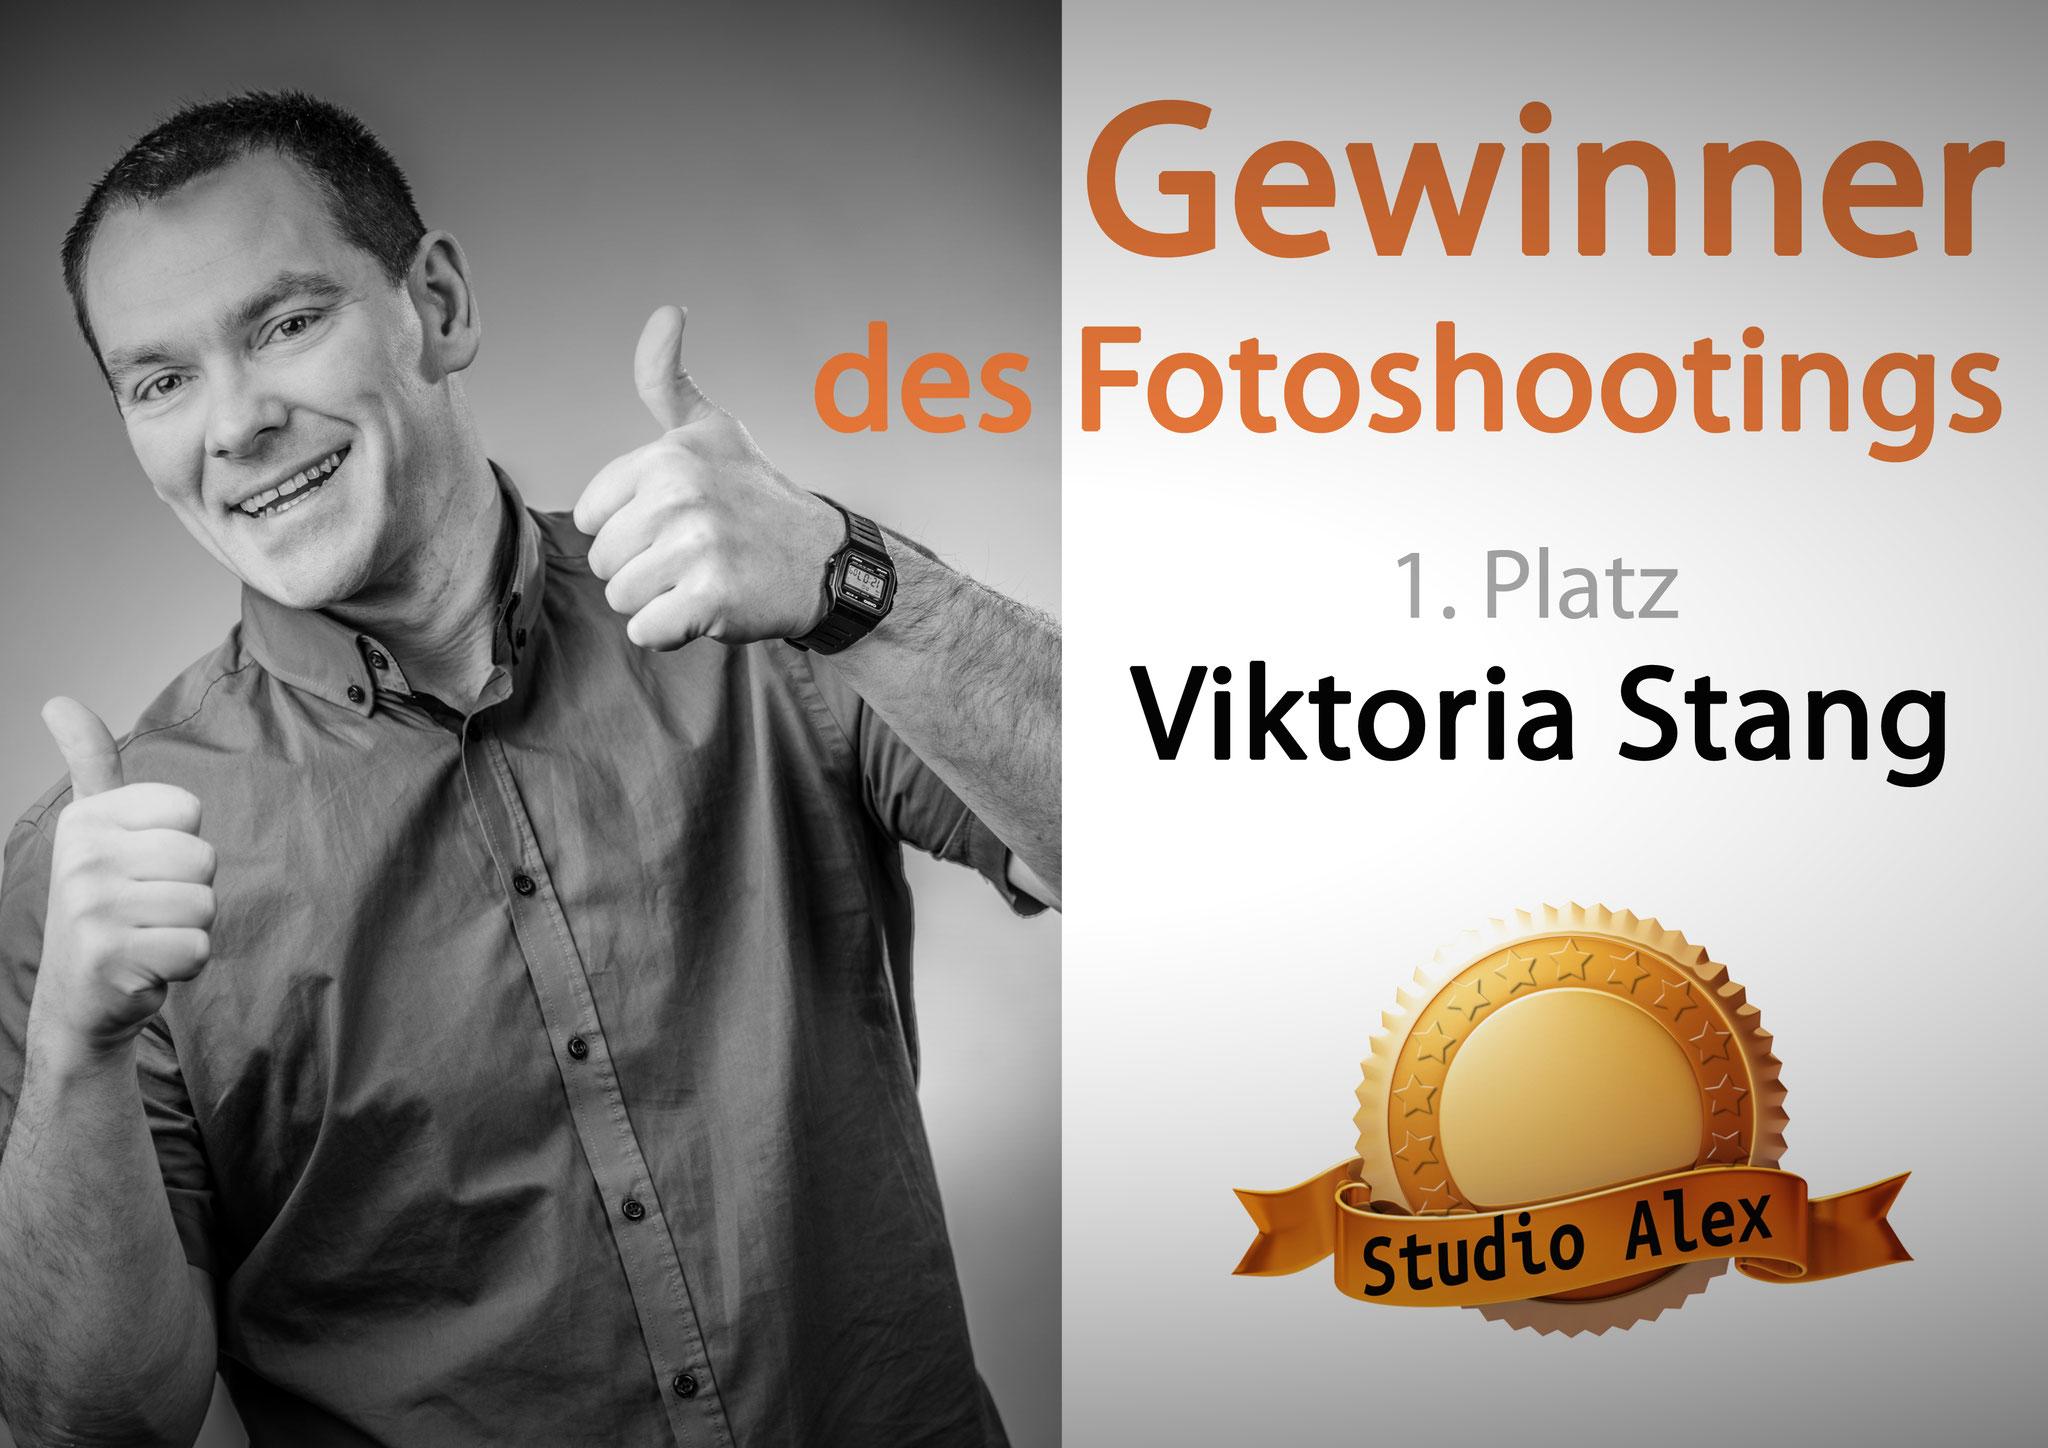 Fotoshooting Gewinnspiel bei Fotostudio Alex